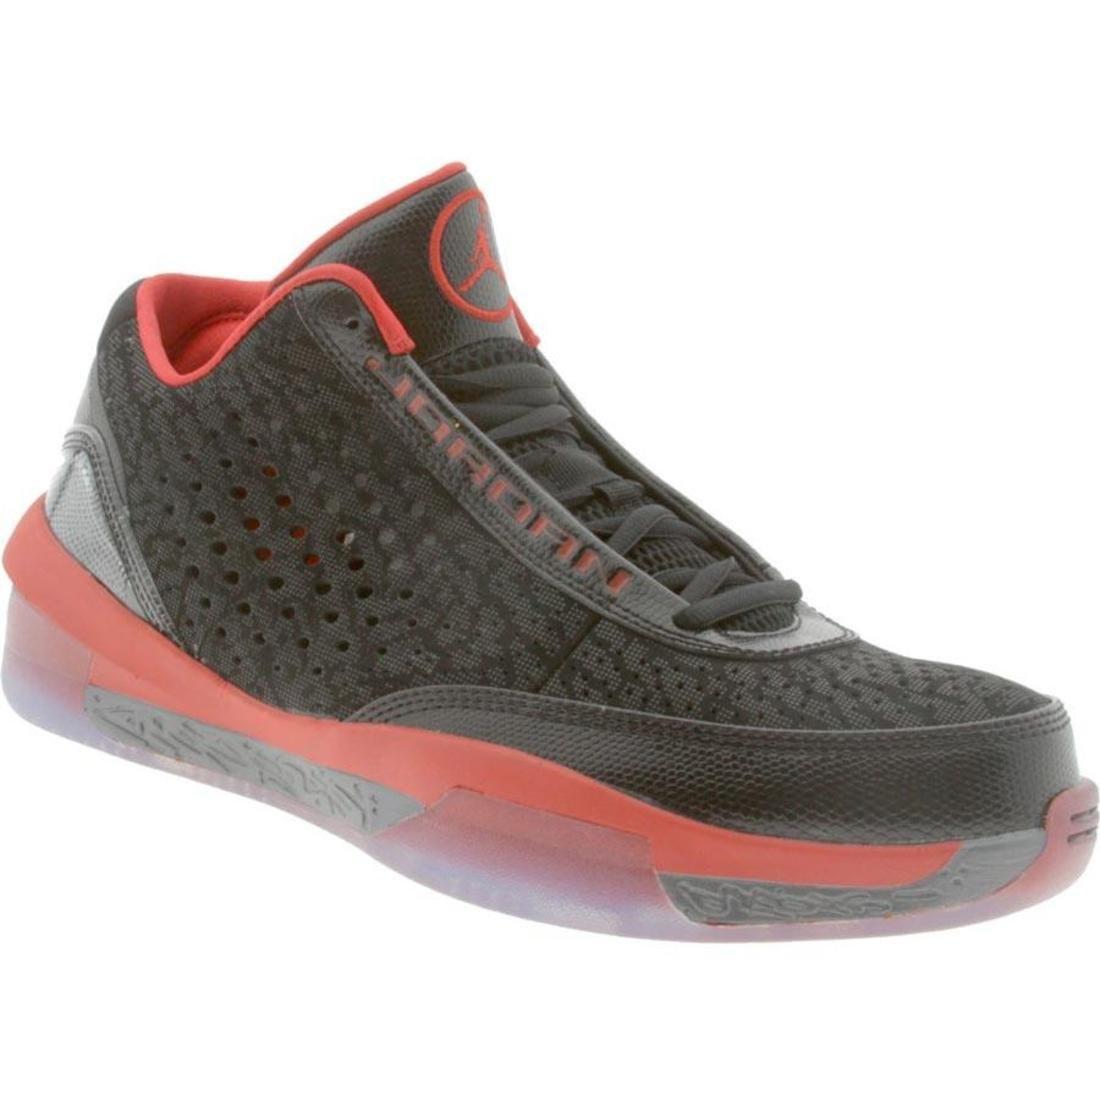 327c2ae8e2faed Amazon.com  Men s Air Jordan 2010 Team (Black-Varsity Red-Light Graphite)(Size 13M)   Sports   Outdoors